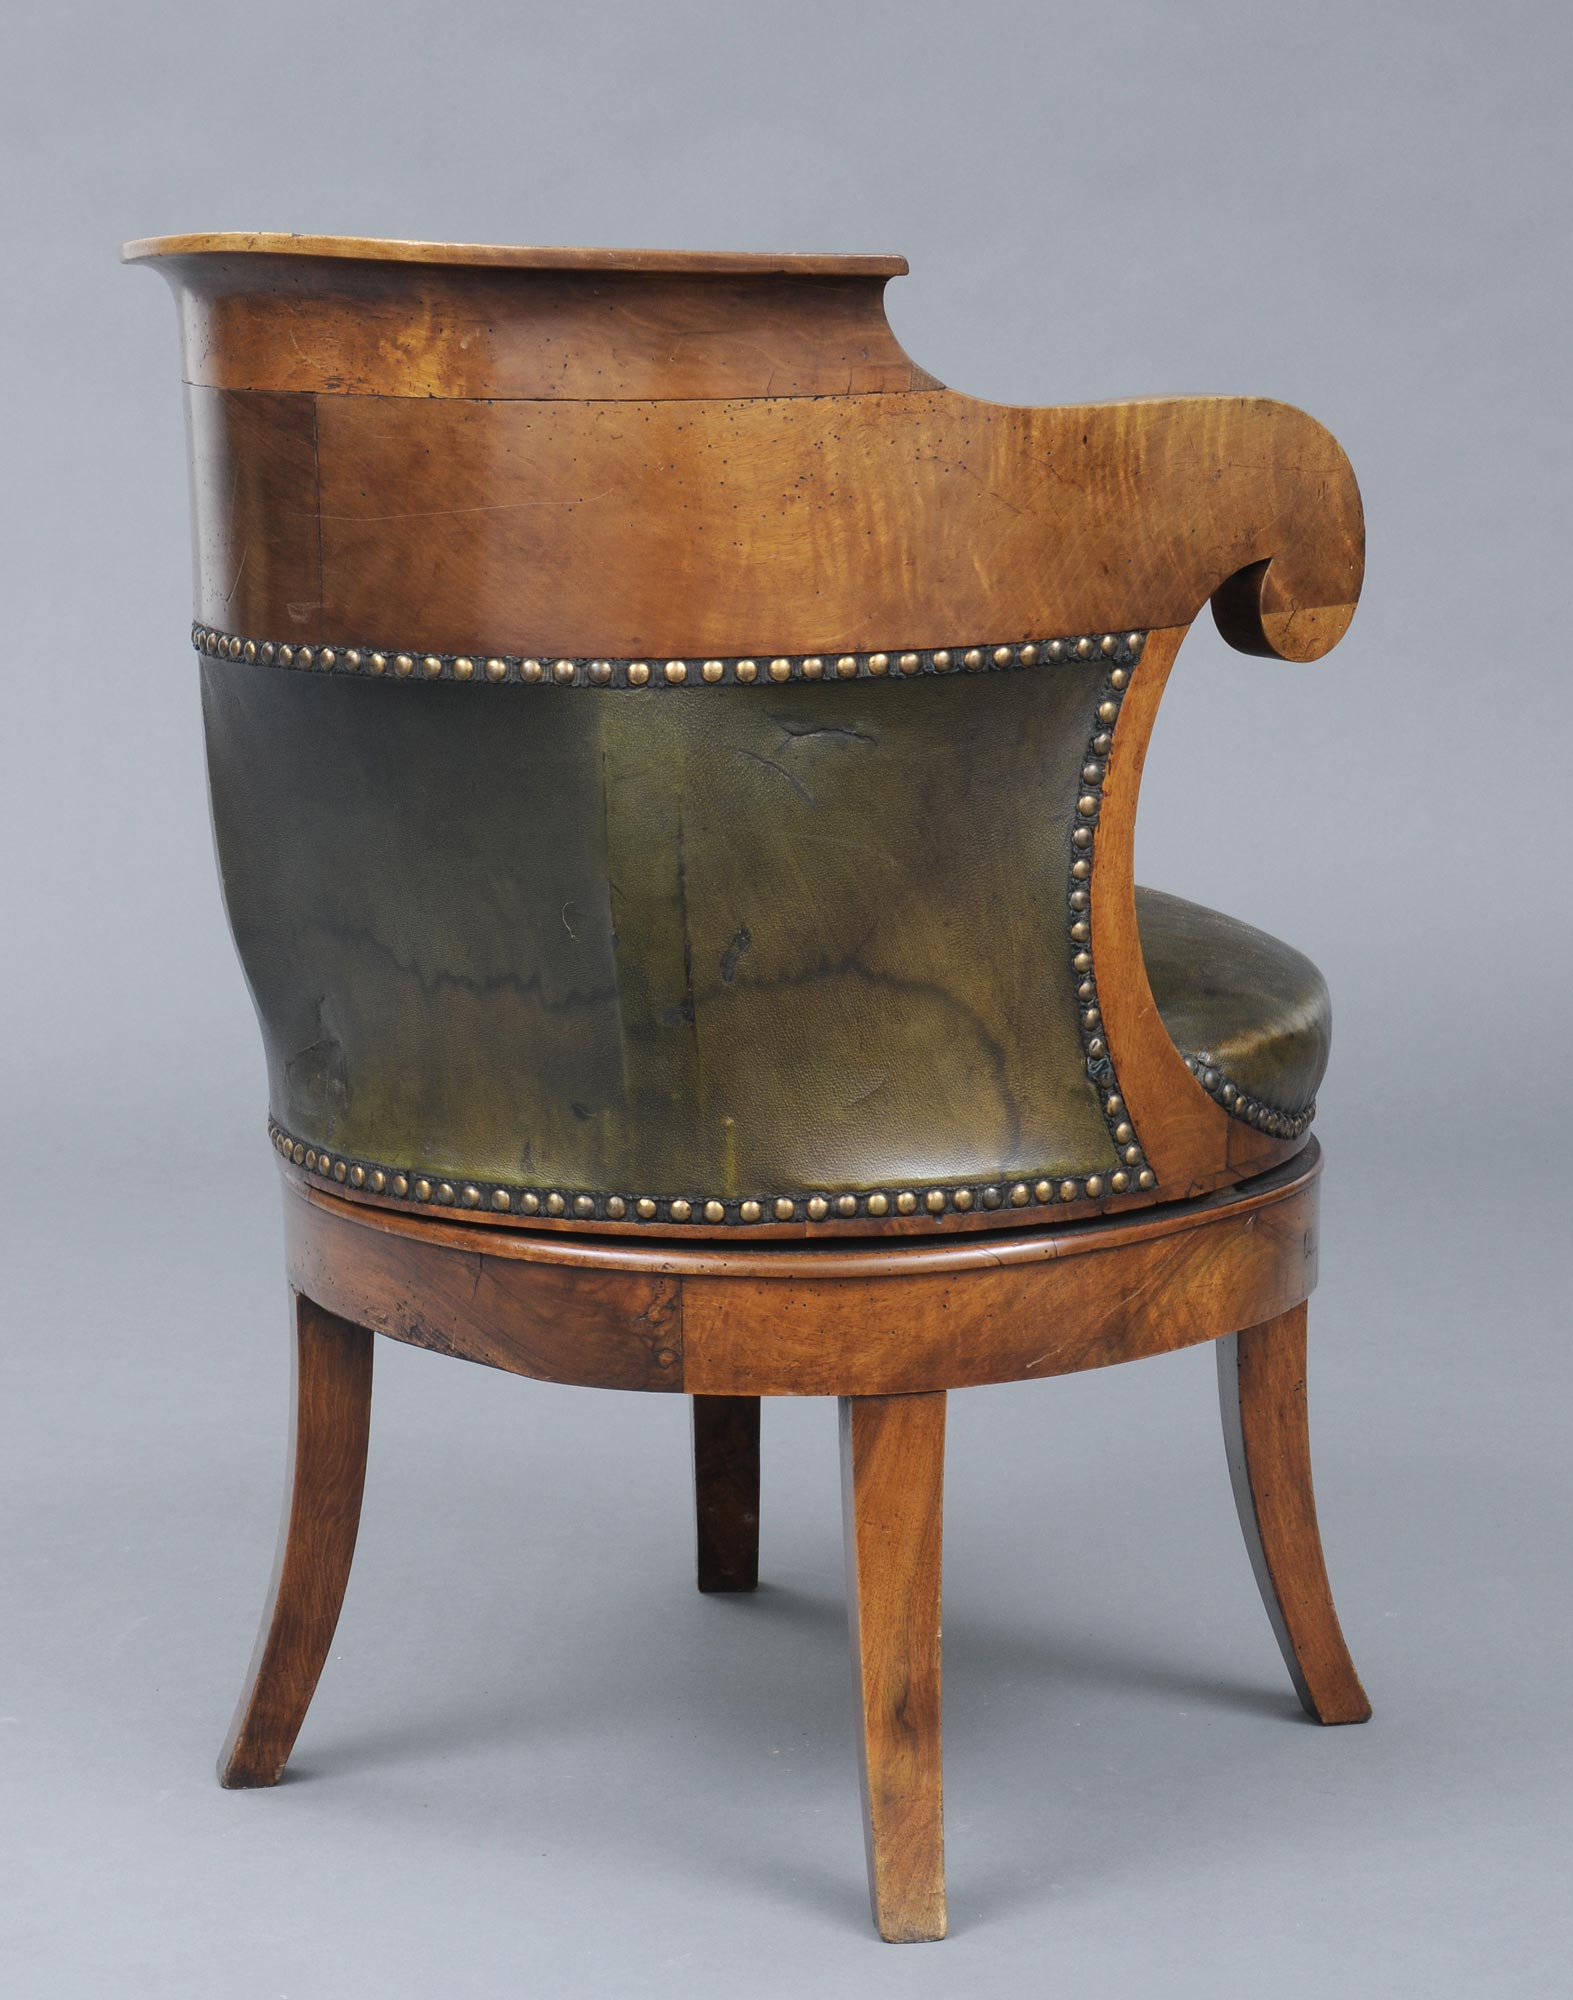 restaurer fauteuil quand je serai grande je veux je veux with comment restaurer un fauteuil. Black Bedroom Furniture Sets. Home Design Ideas